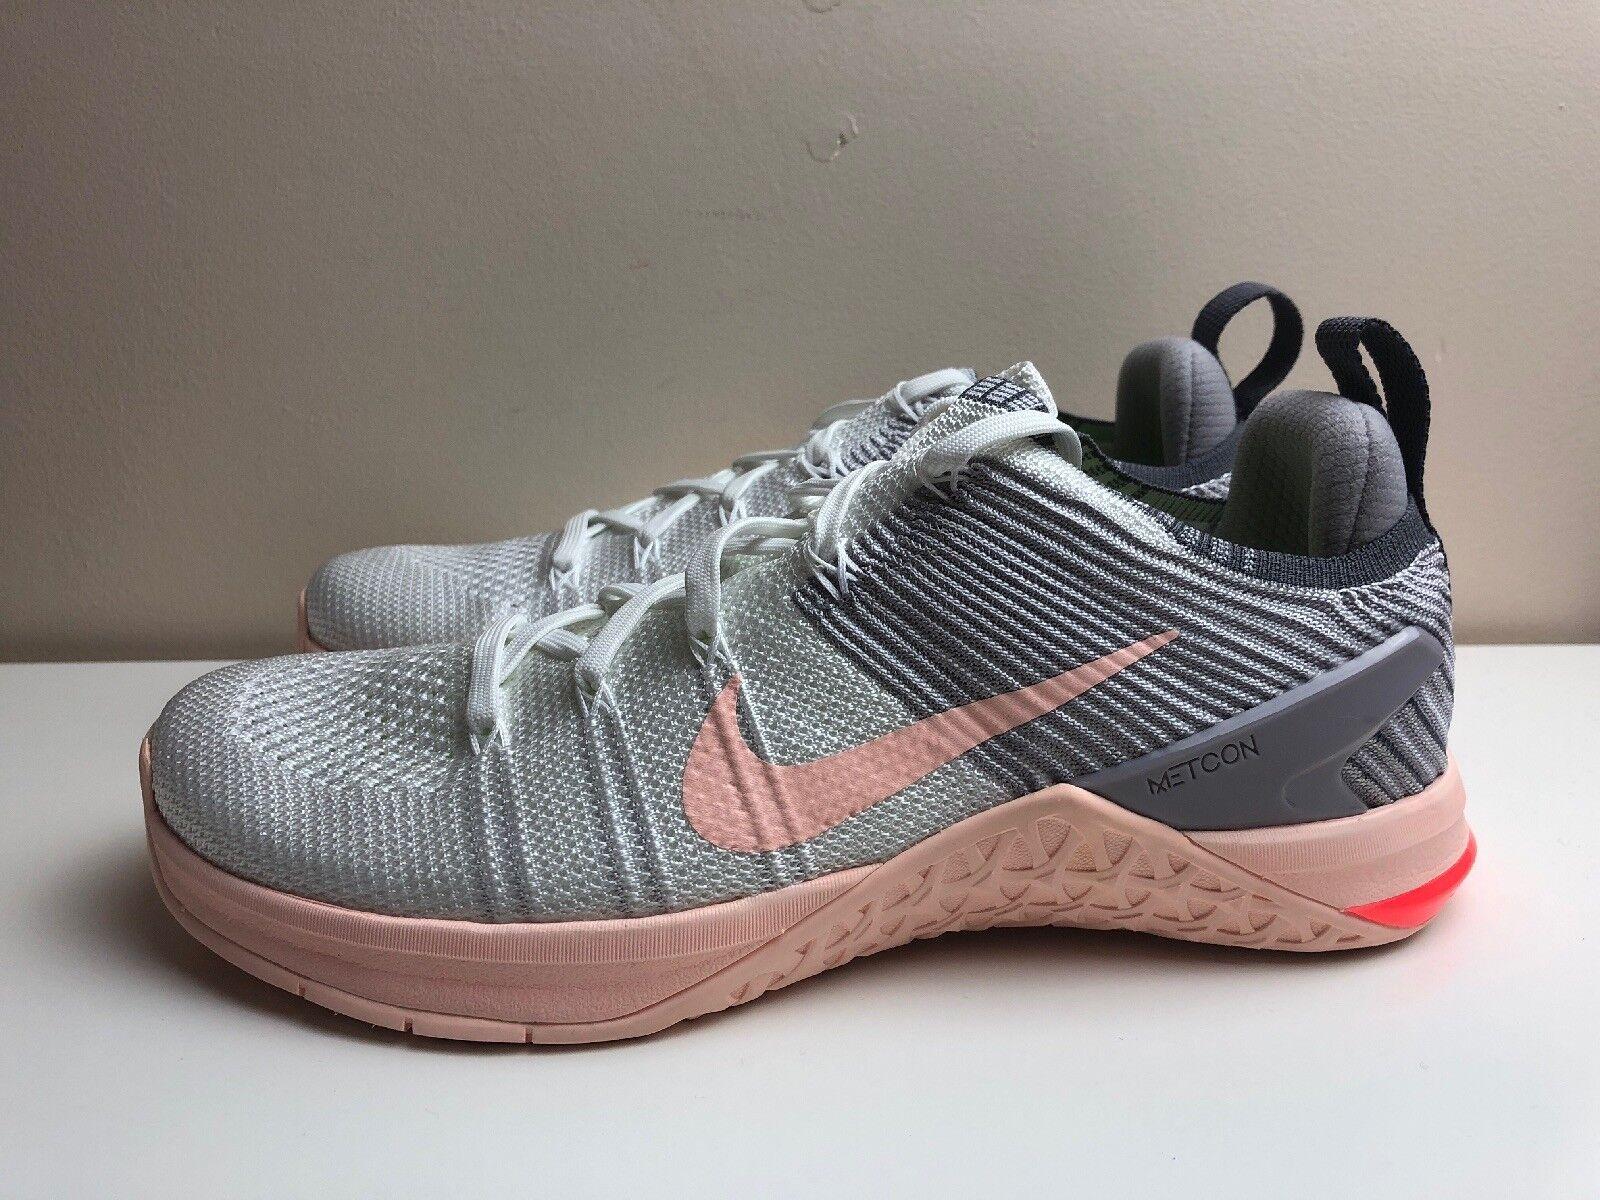 Nike Metcon DSX Flyknit Crossfit 2 pour femme UK 7 EUR 41 blanc gris 924595 102